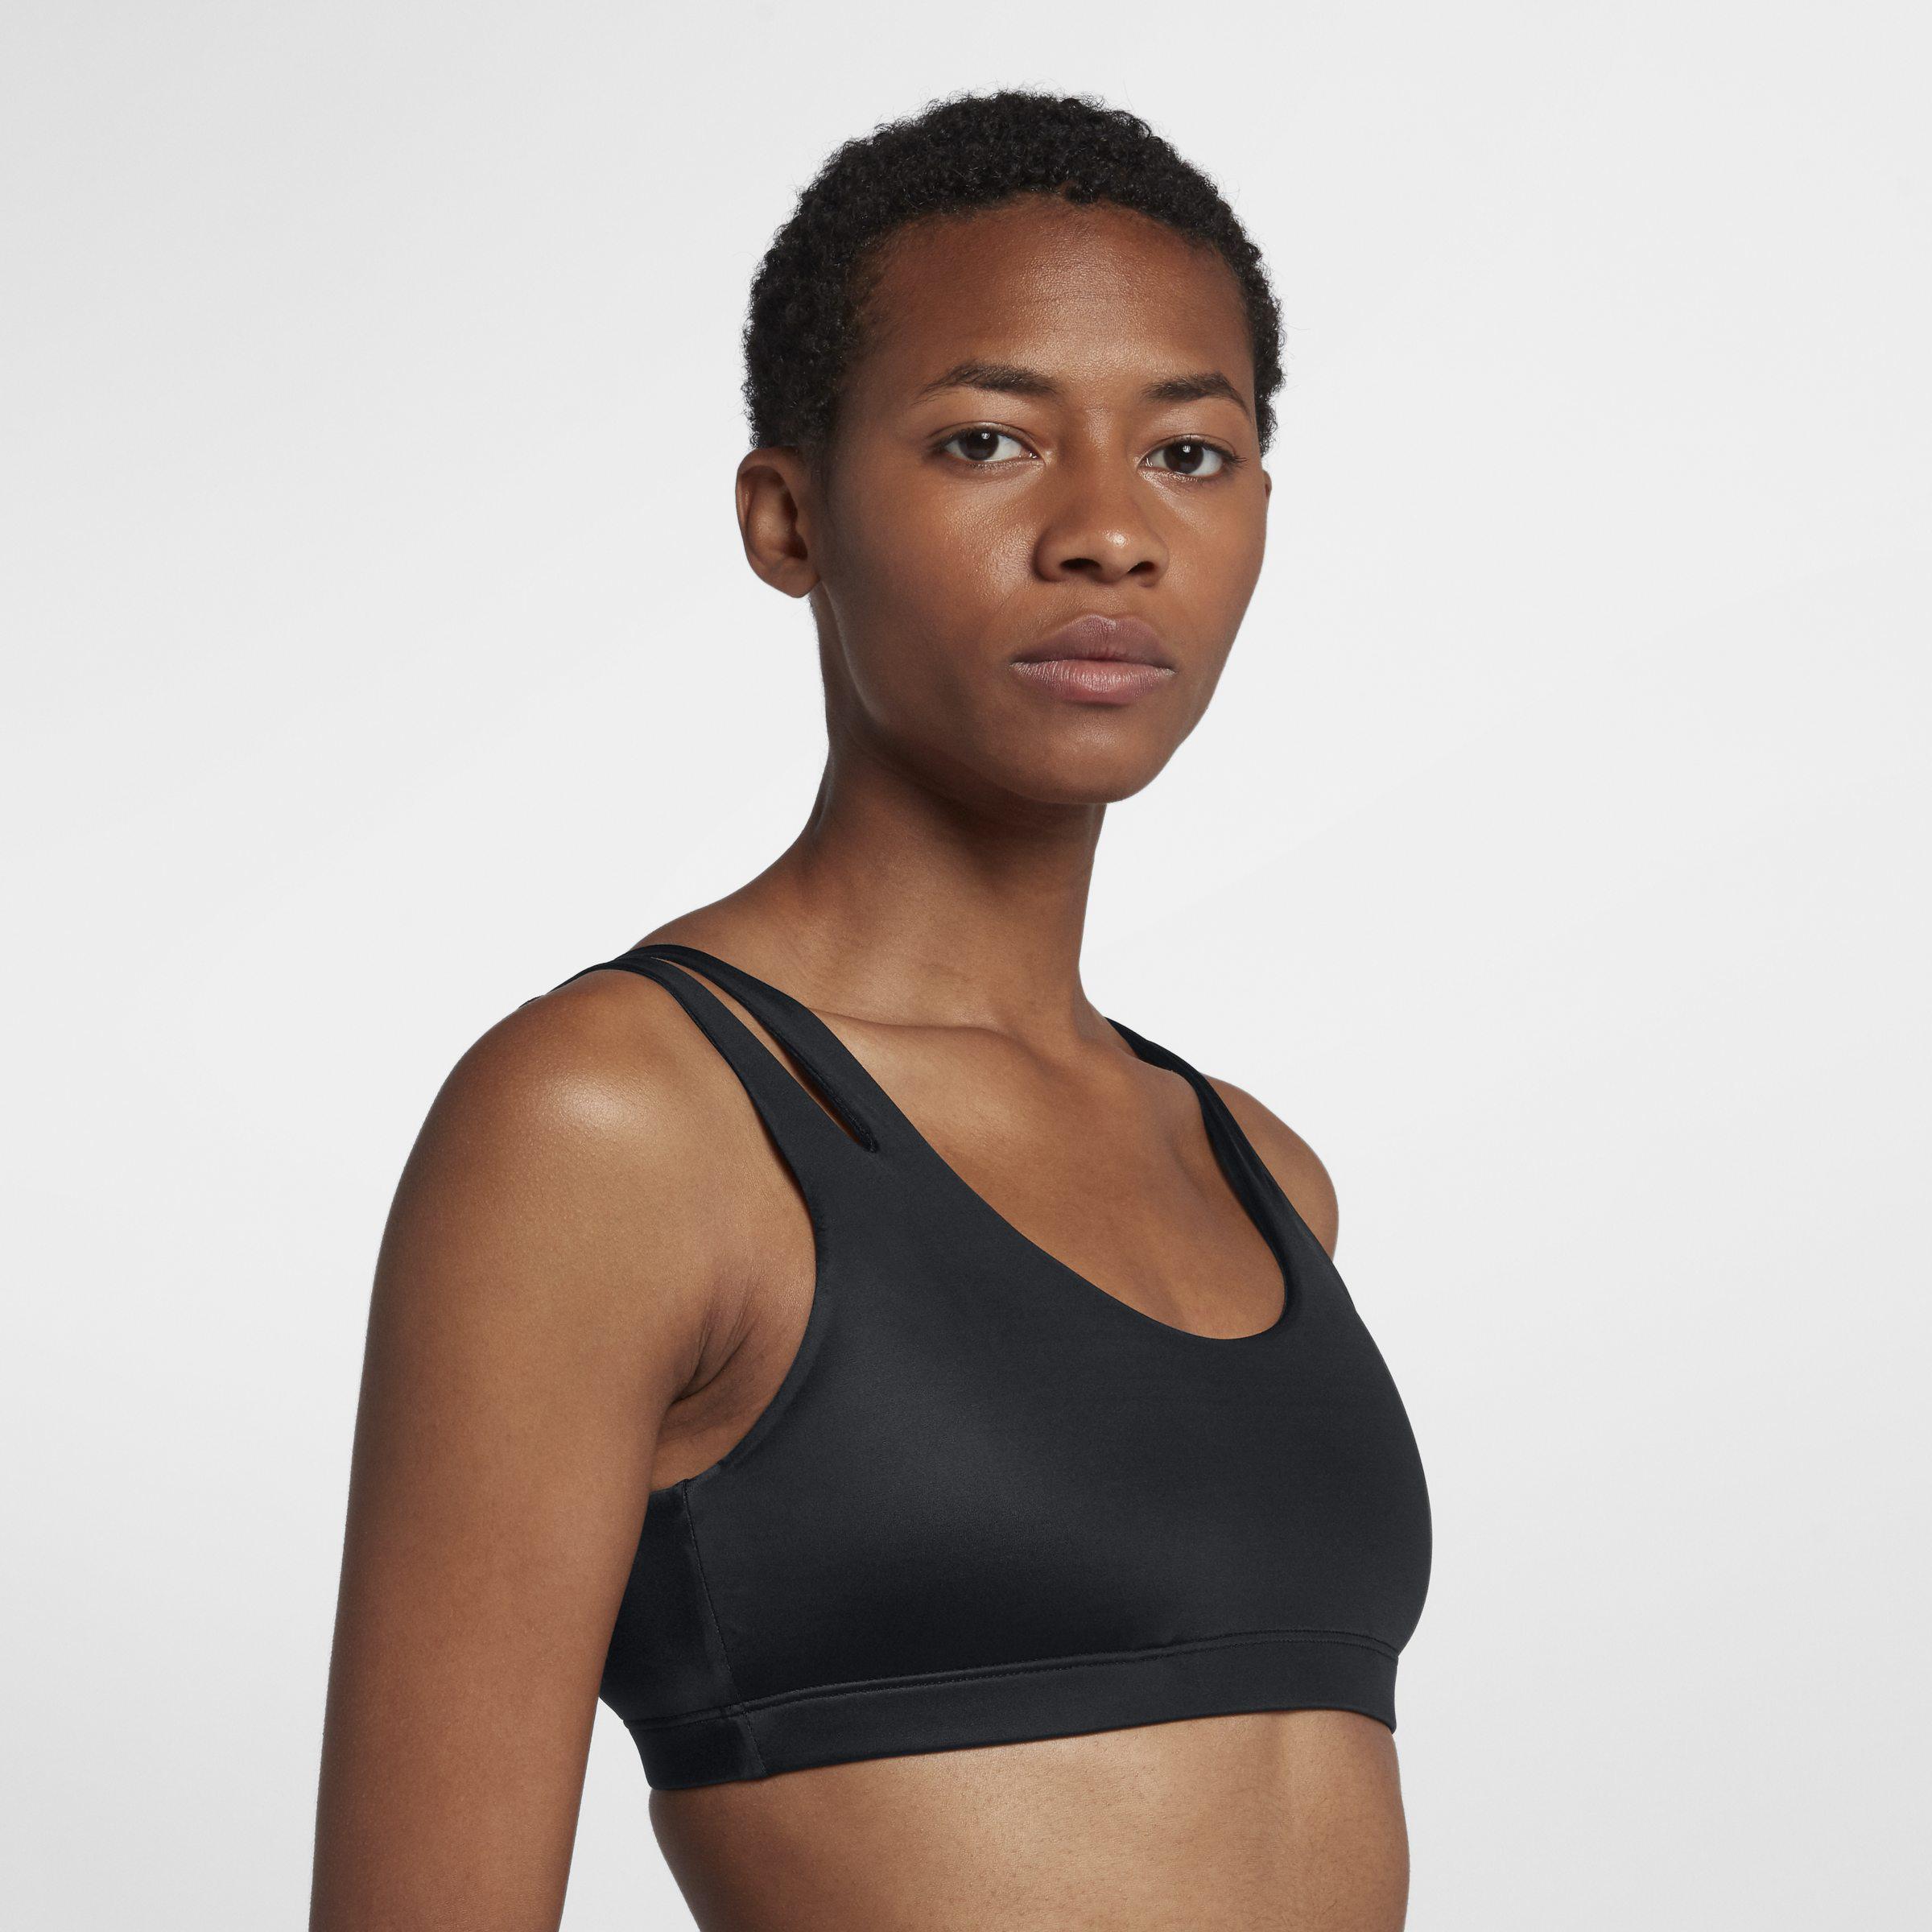 7259b7cd422f Nike Indy Shine Light-support Sports Bra in Black - Lyst